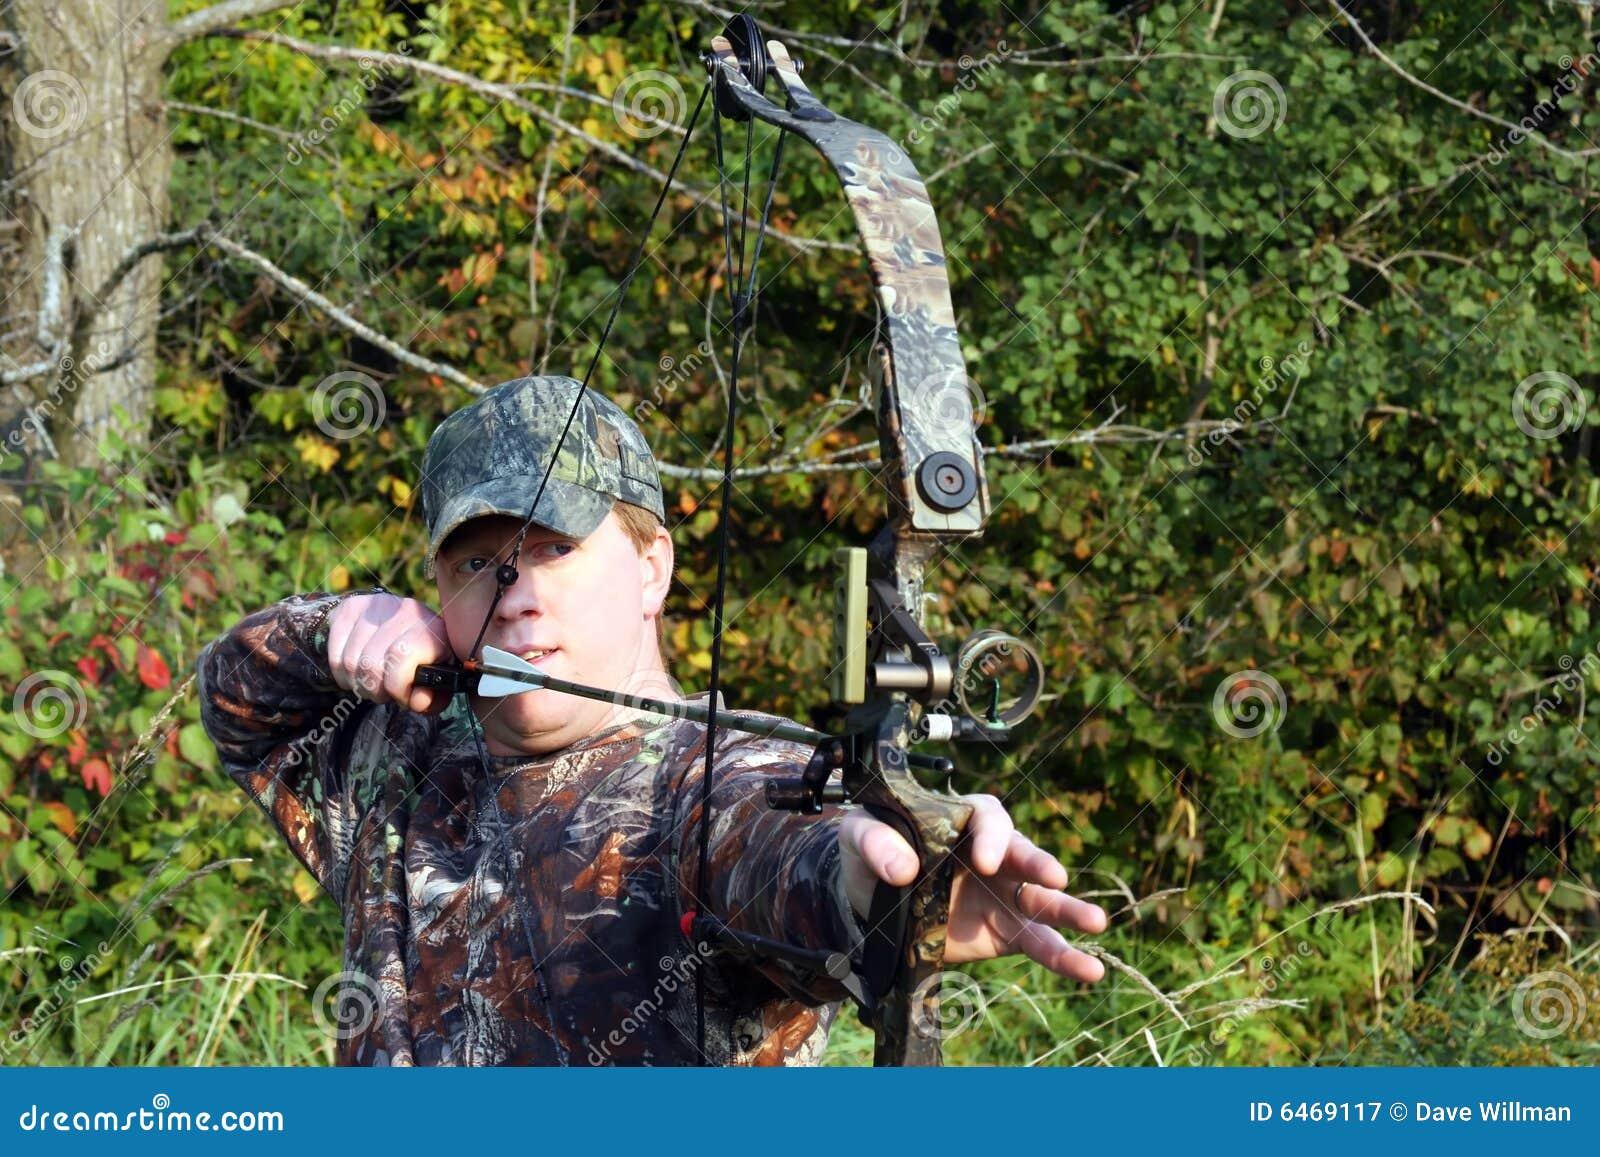 Hunter bow